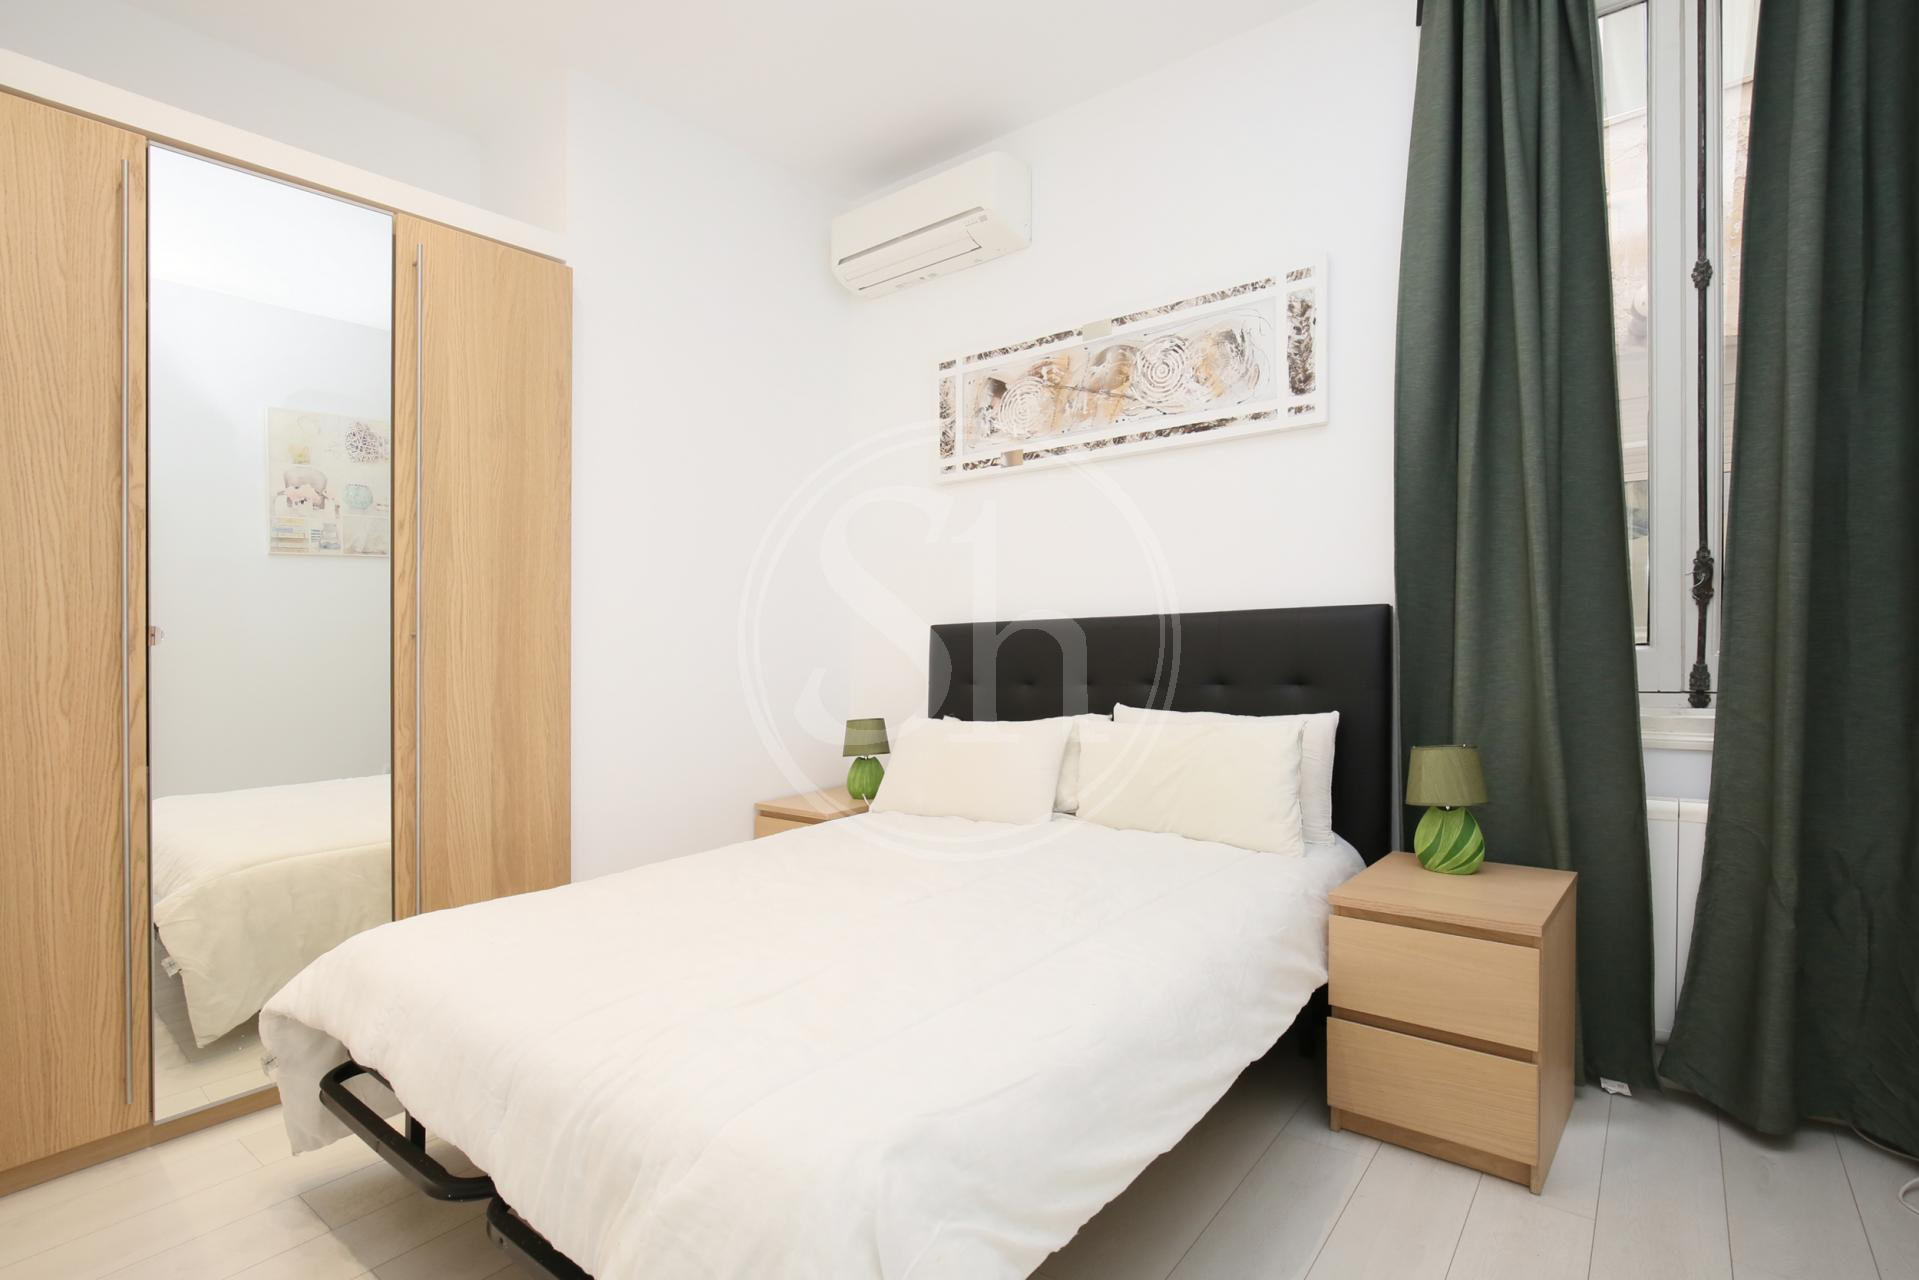 Appartement à louer à Madrid Espiritu Santo - San Bernardo